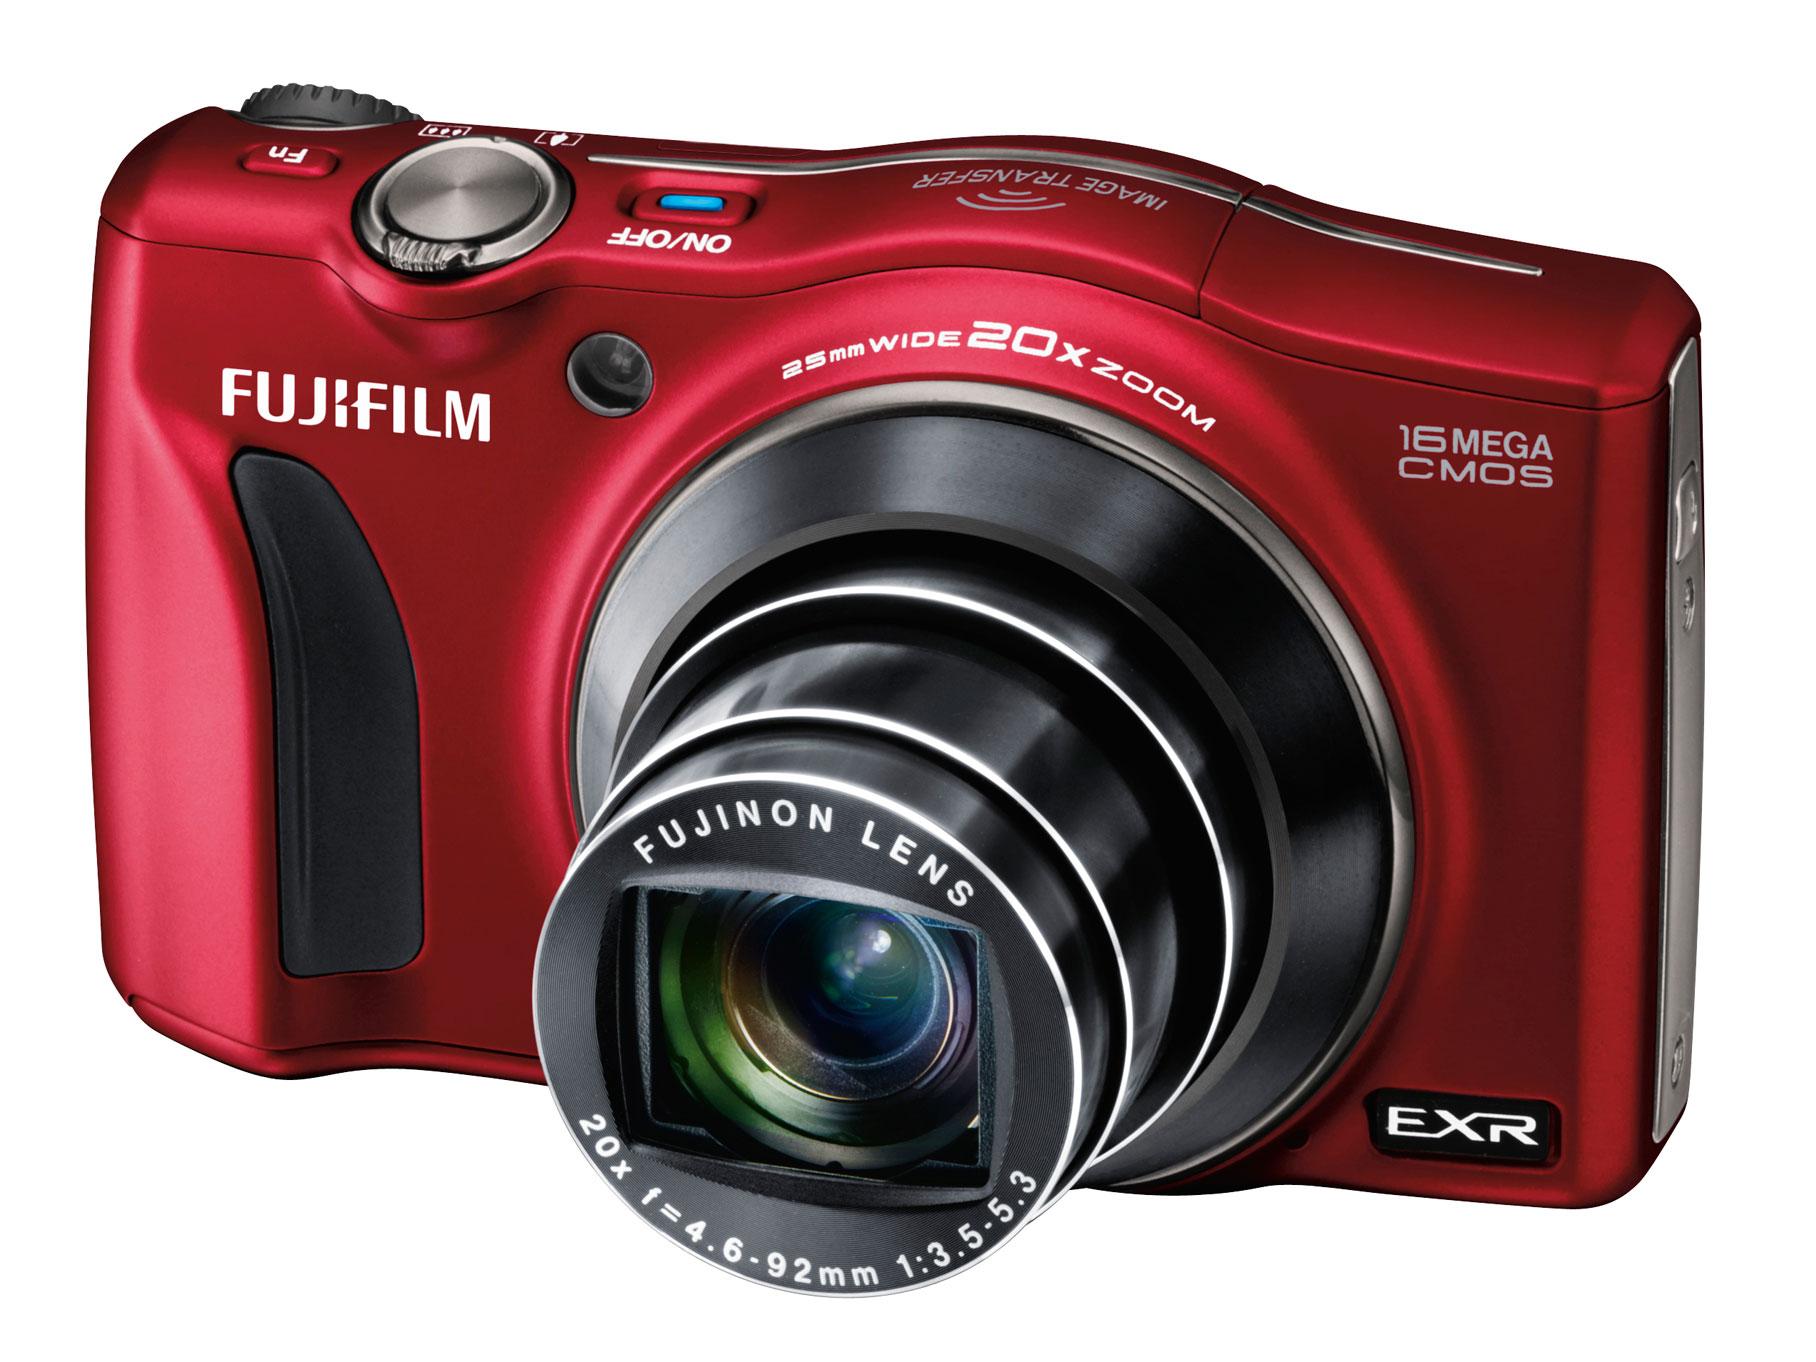 Fujifilm Brings Wireless Image Transfer to Compact Long-zoom F800EXR